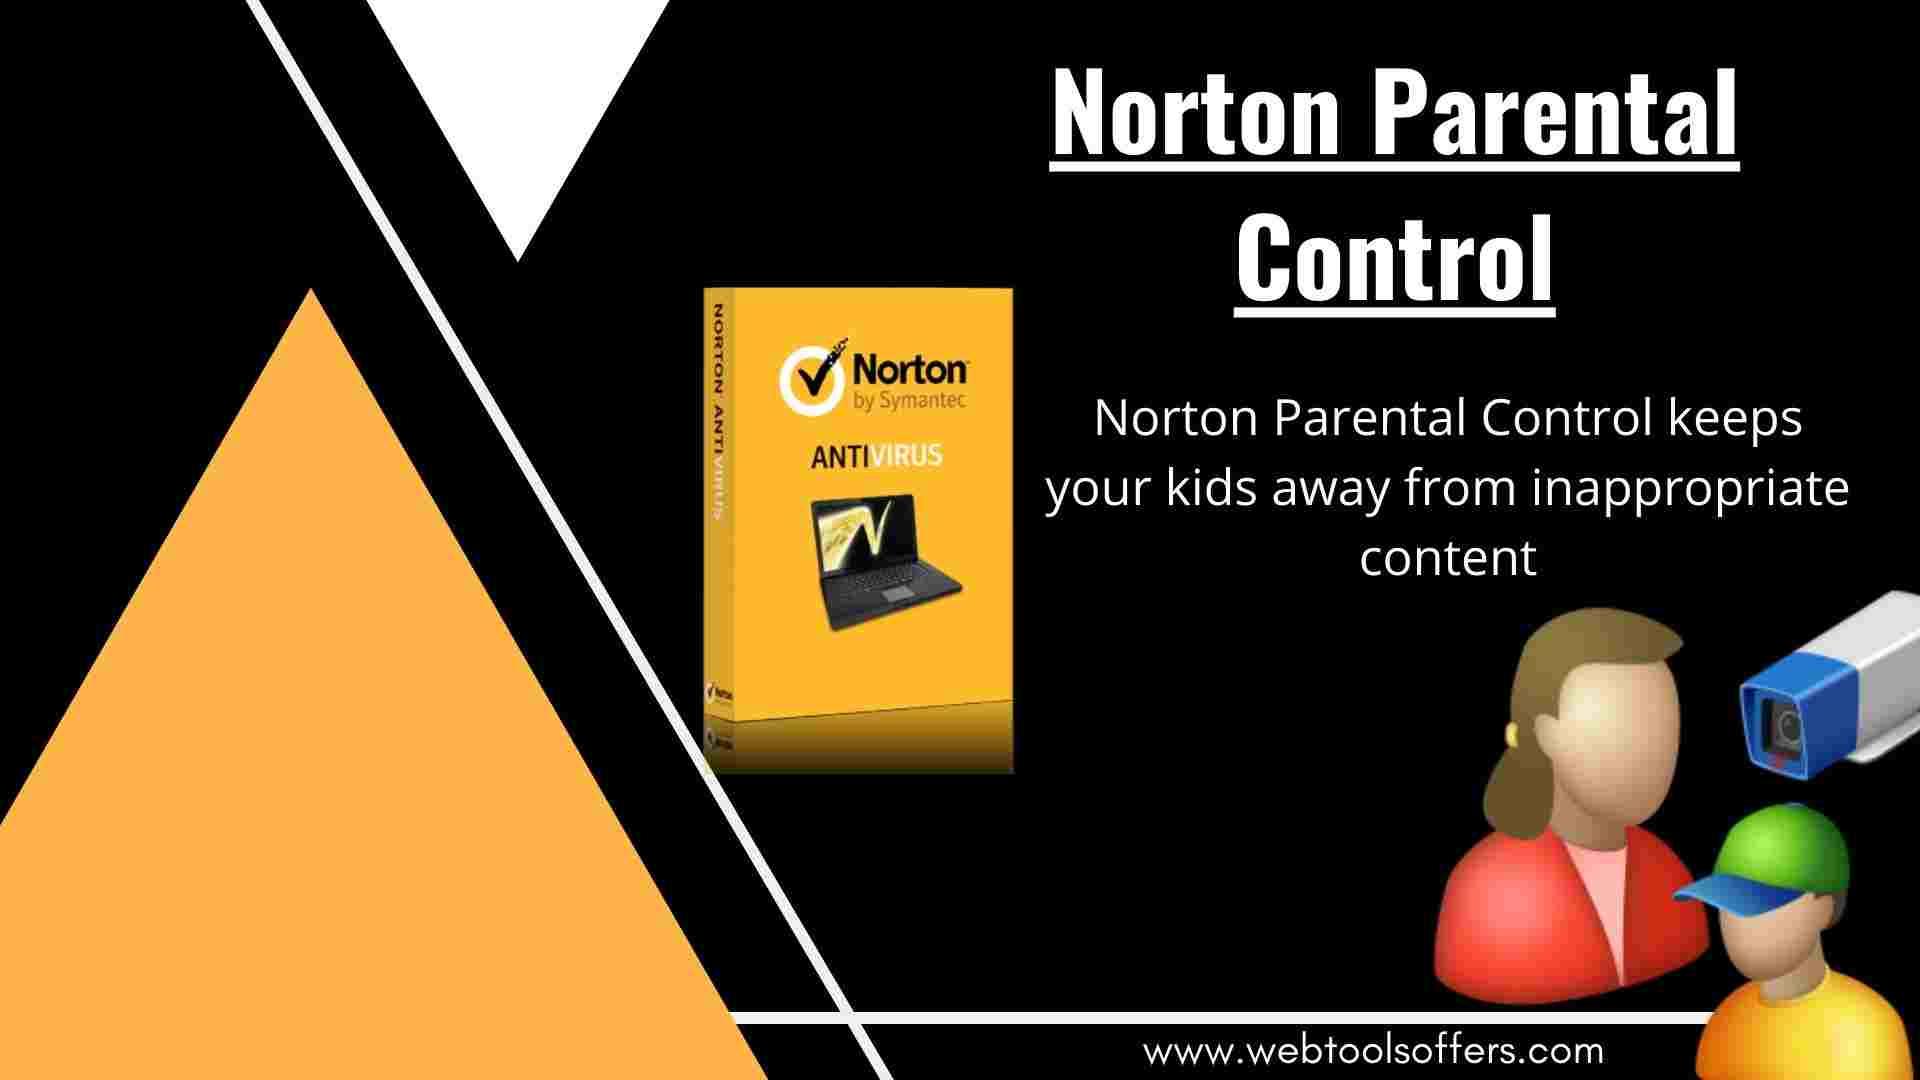 Norton Parental Control